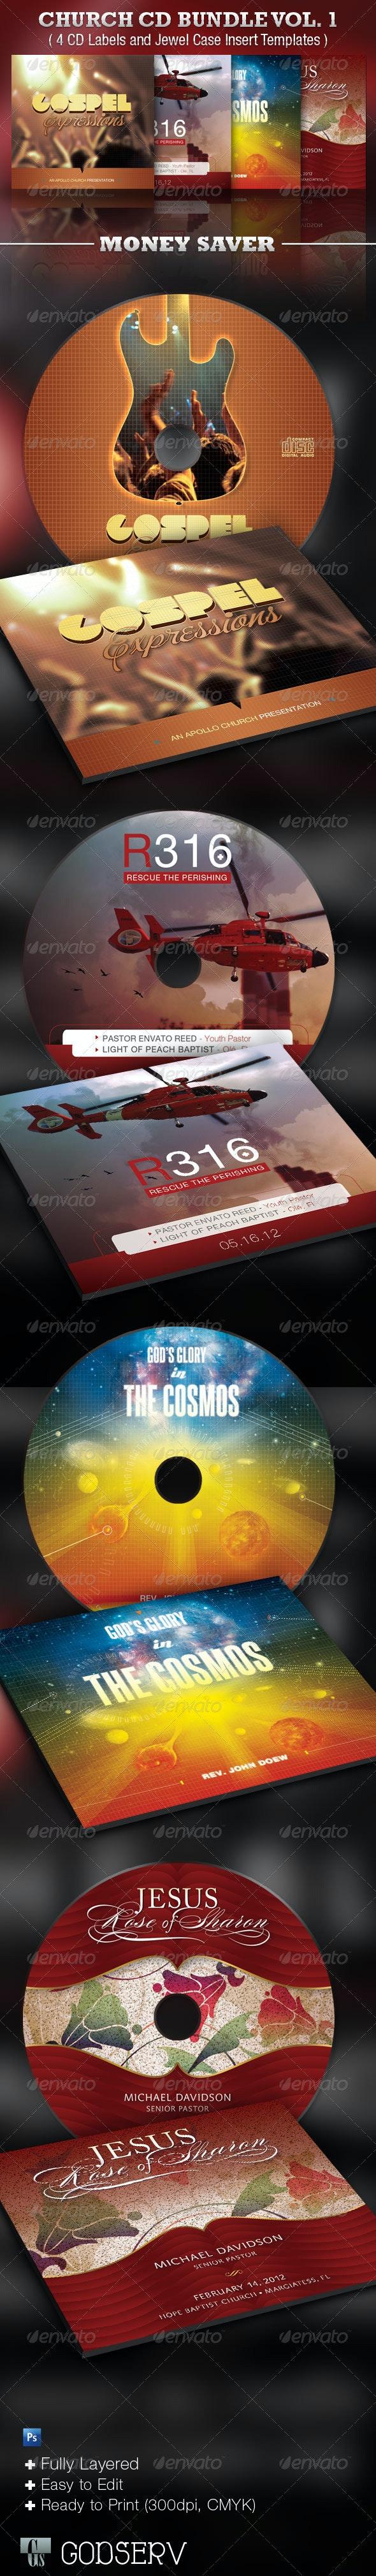 Church CD Template Bundle Vol 1 - CD & DVD Artwork Print Templates